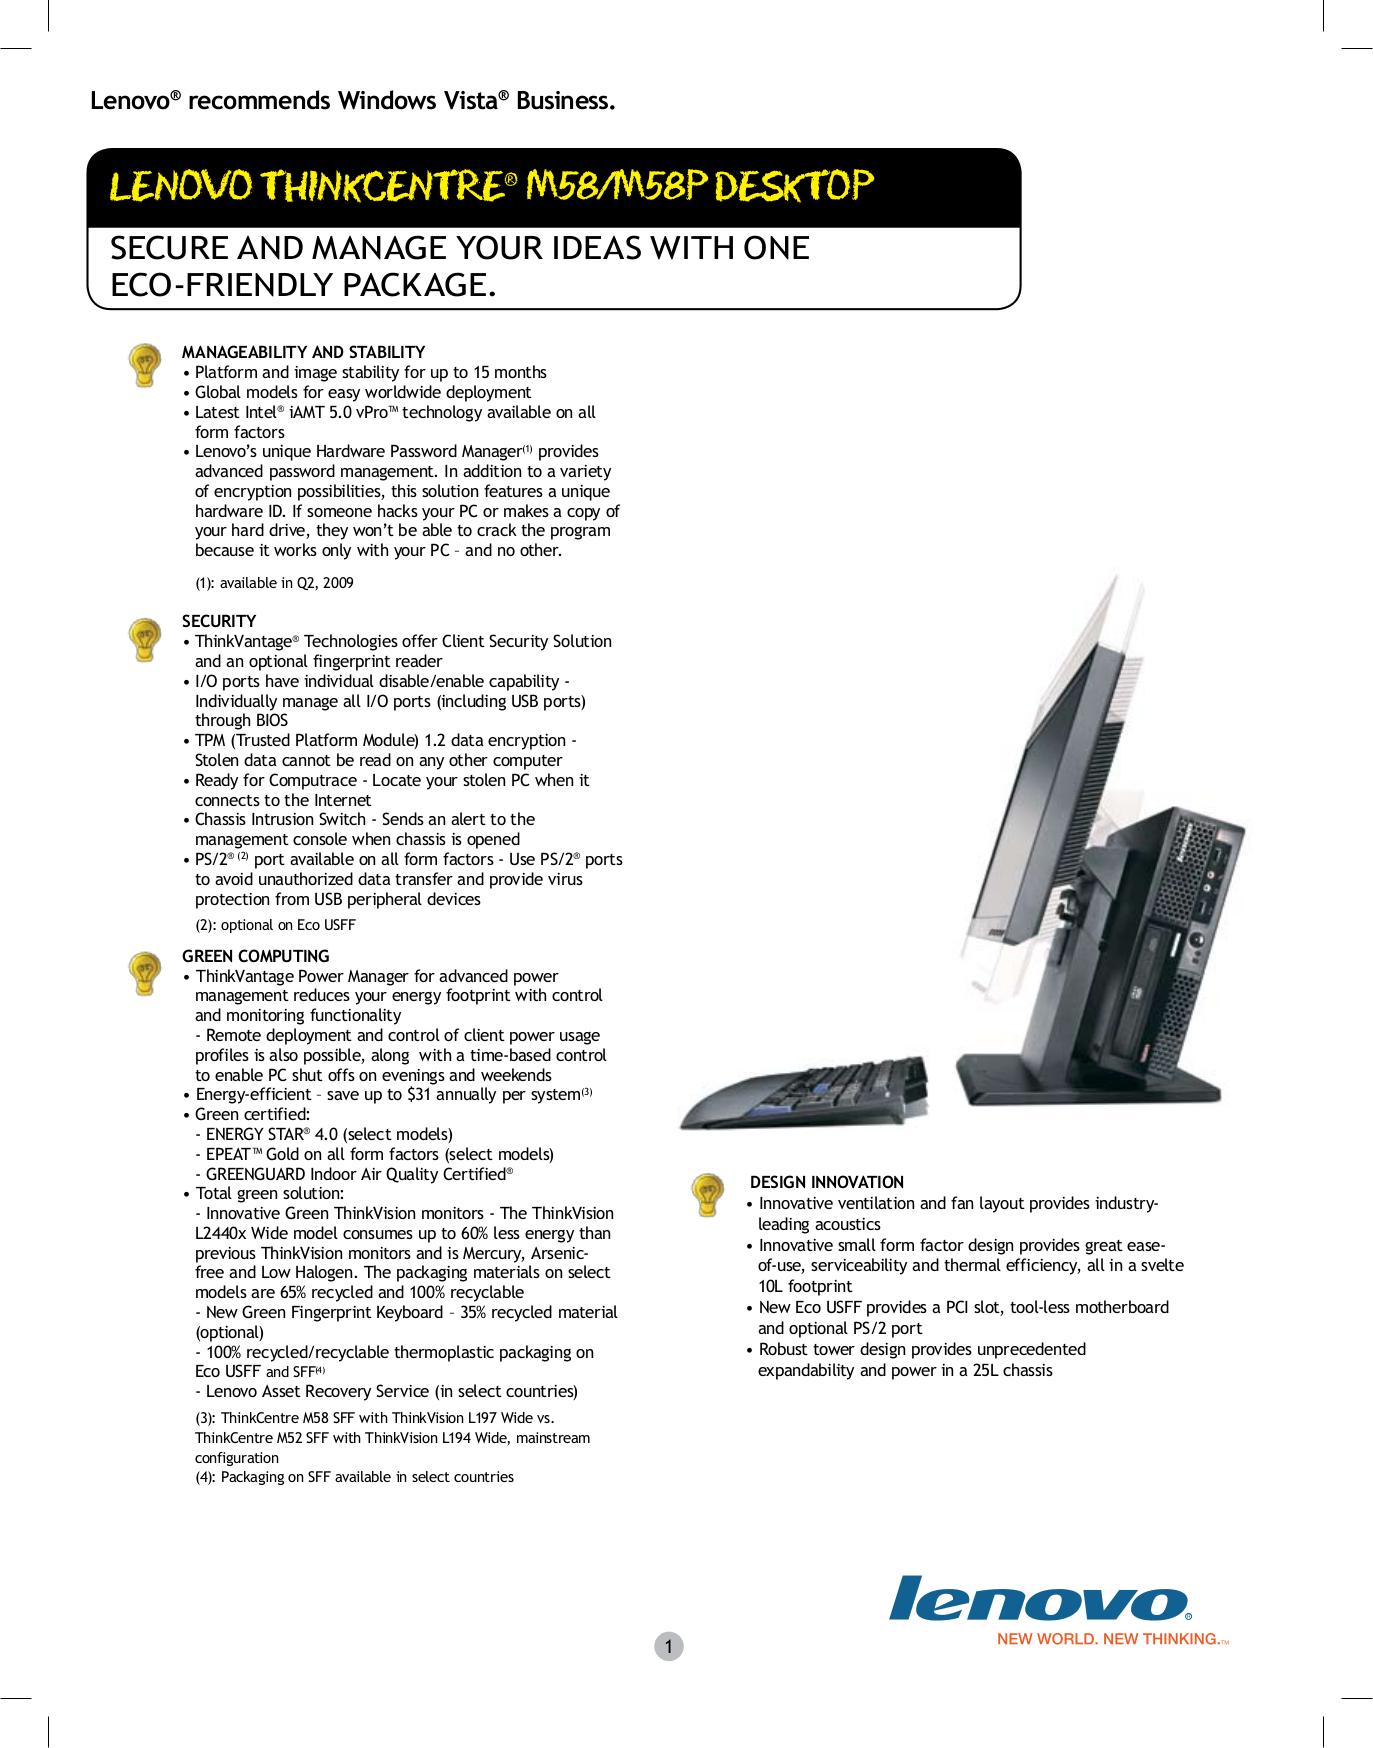 pdf for Lenovo Desktop ThinkCentre M58p 7357 manual